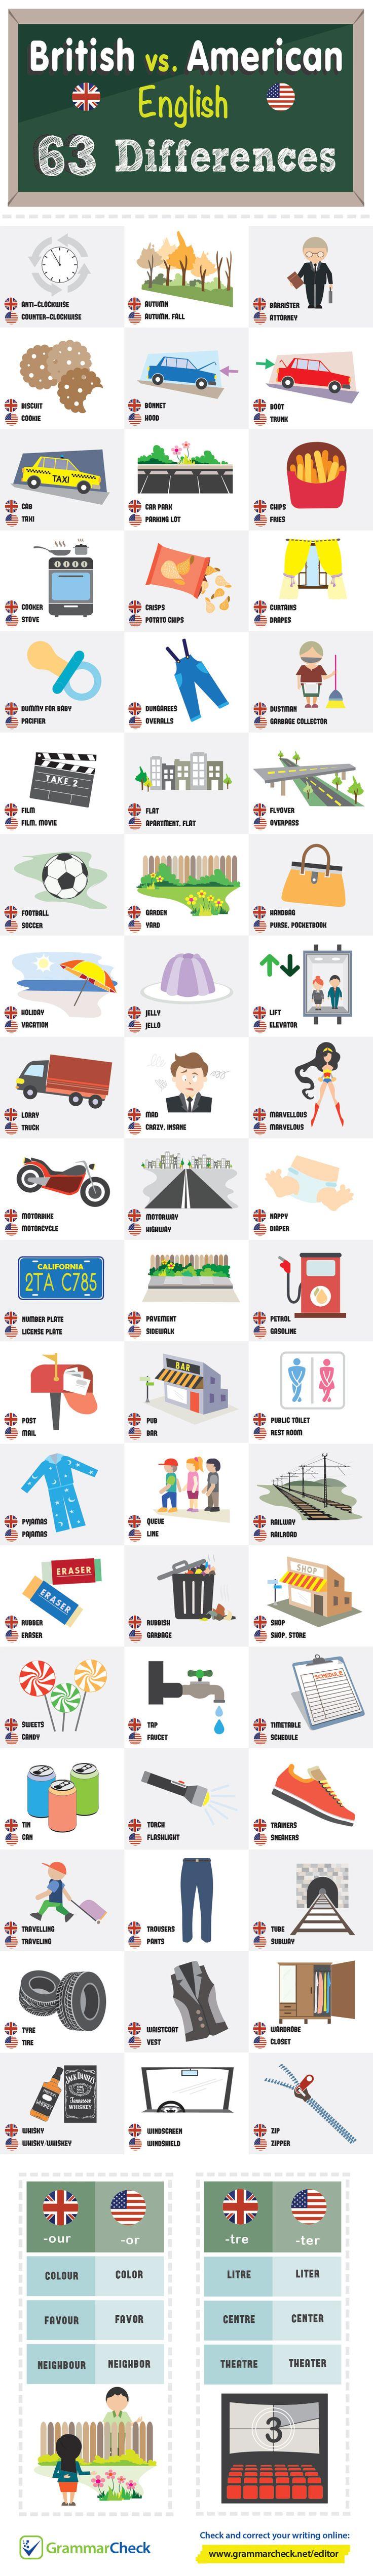 British vs. American English: 63 Differences (Infographic)